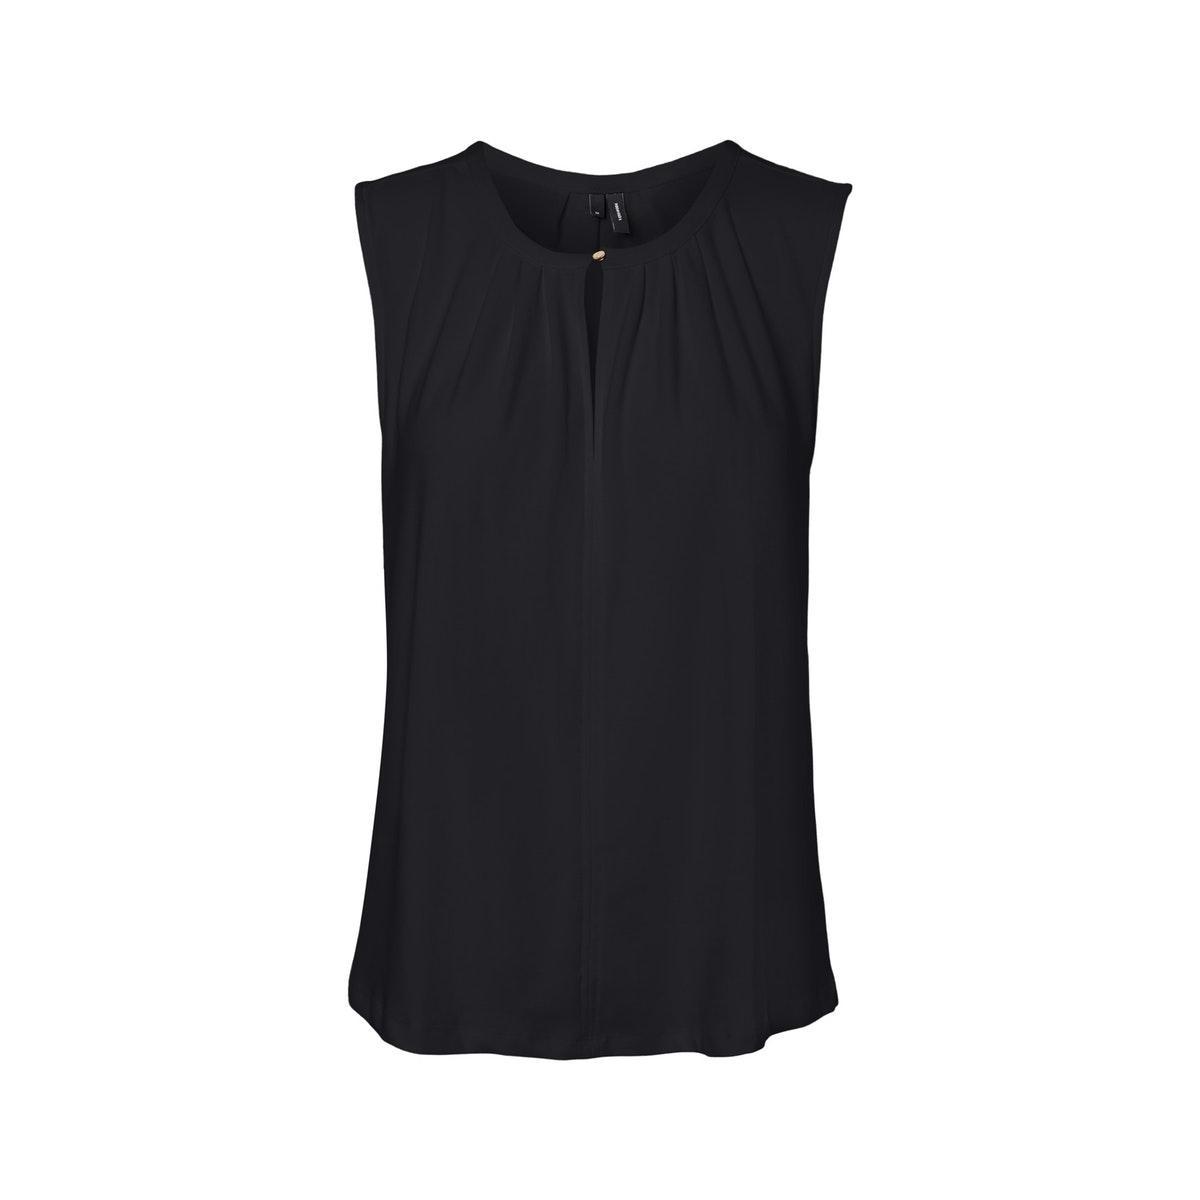 vmmilla sl button top ga vo 10229466 vero moda top black